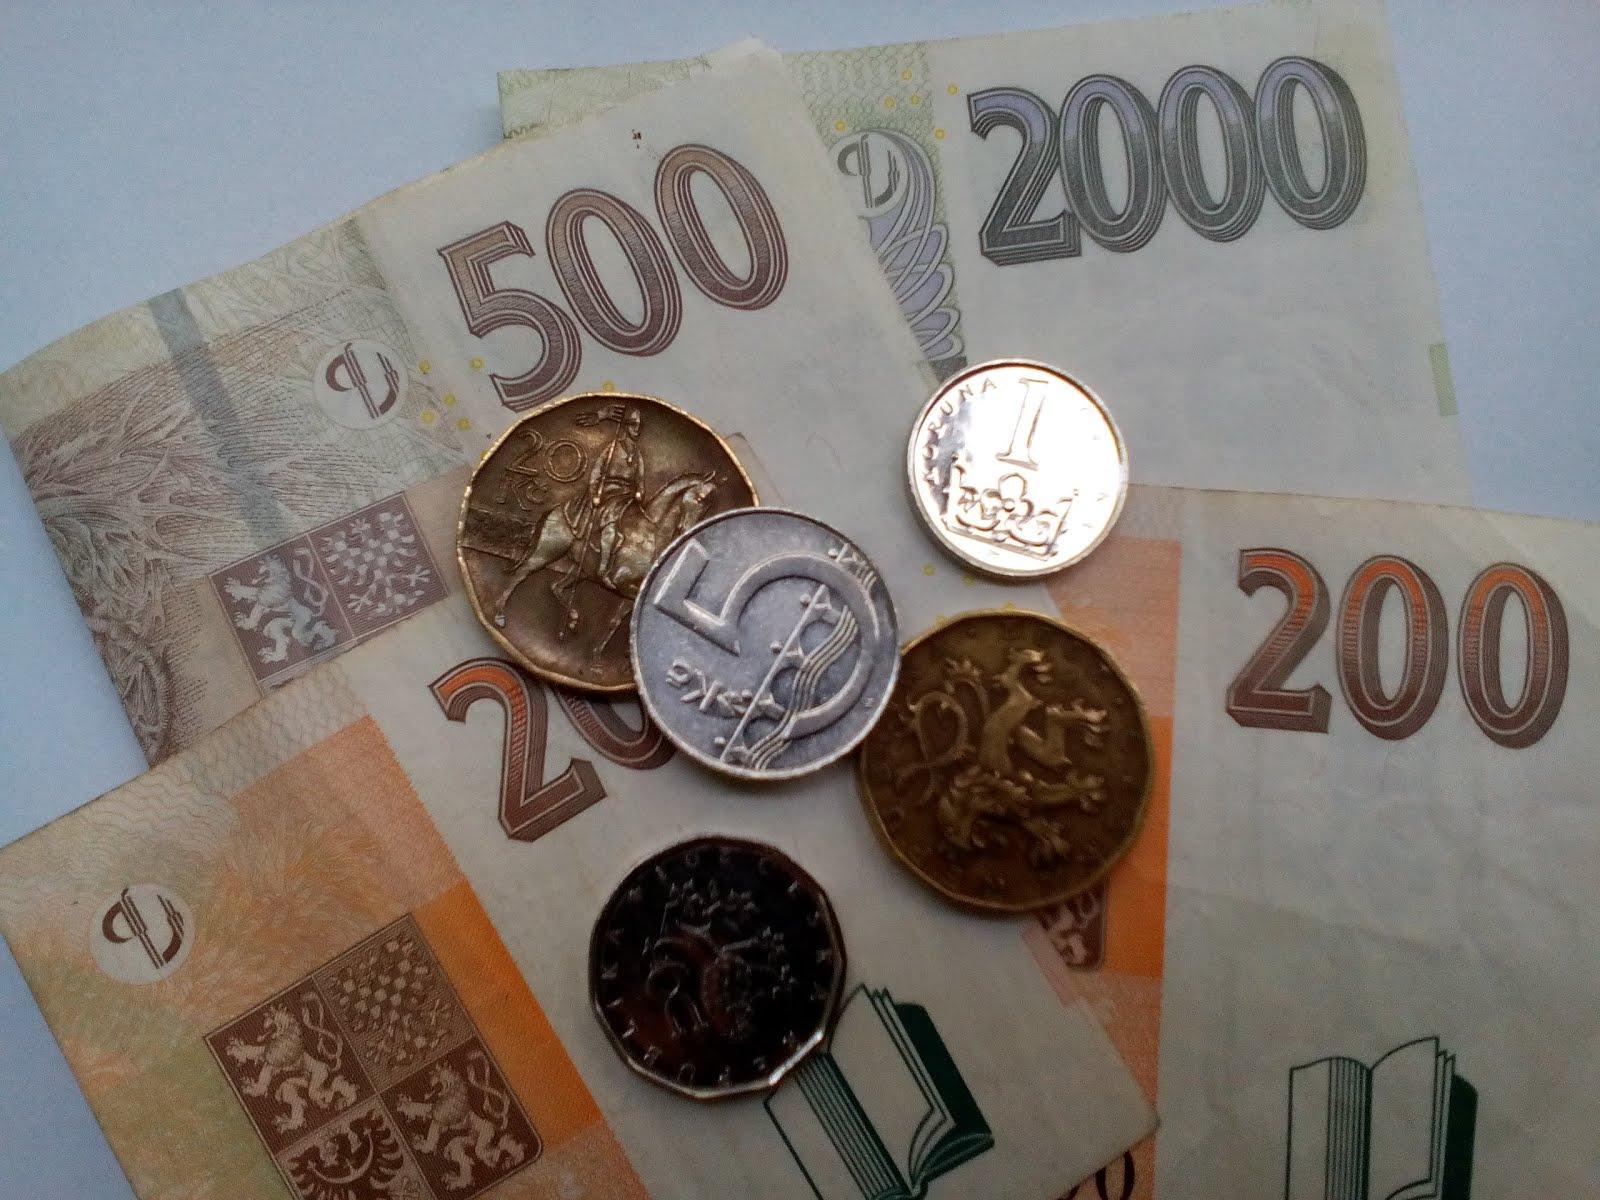 Okamžitá online půjčka